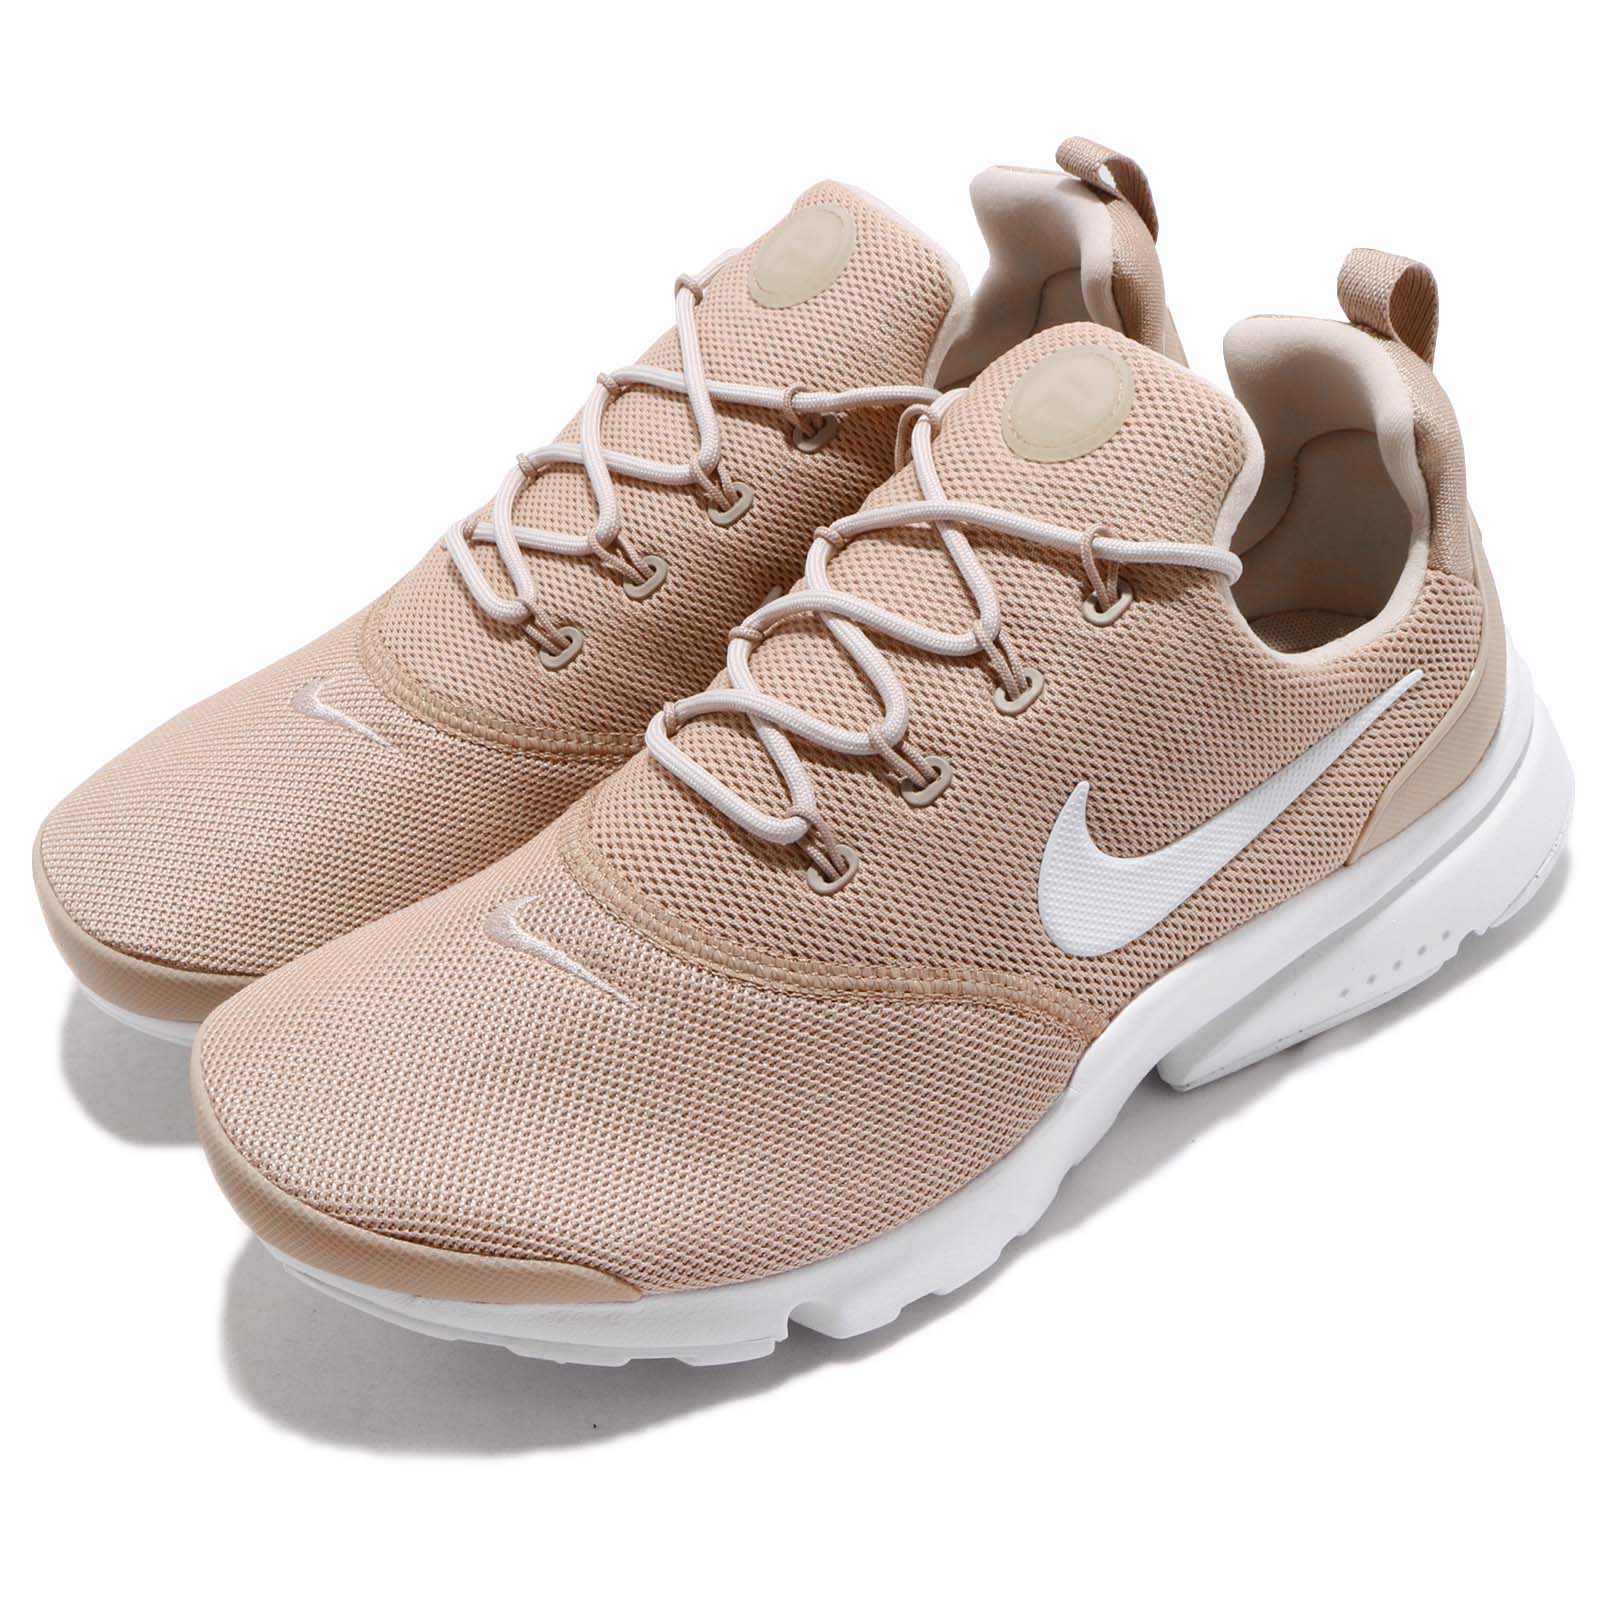 Nike 休閒鞋 Presto Fly 魚骨鞋 女鞋 910569-201